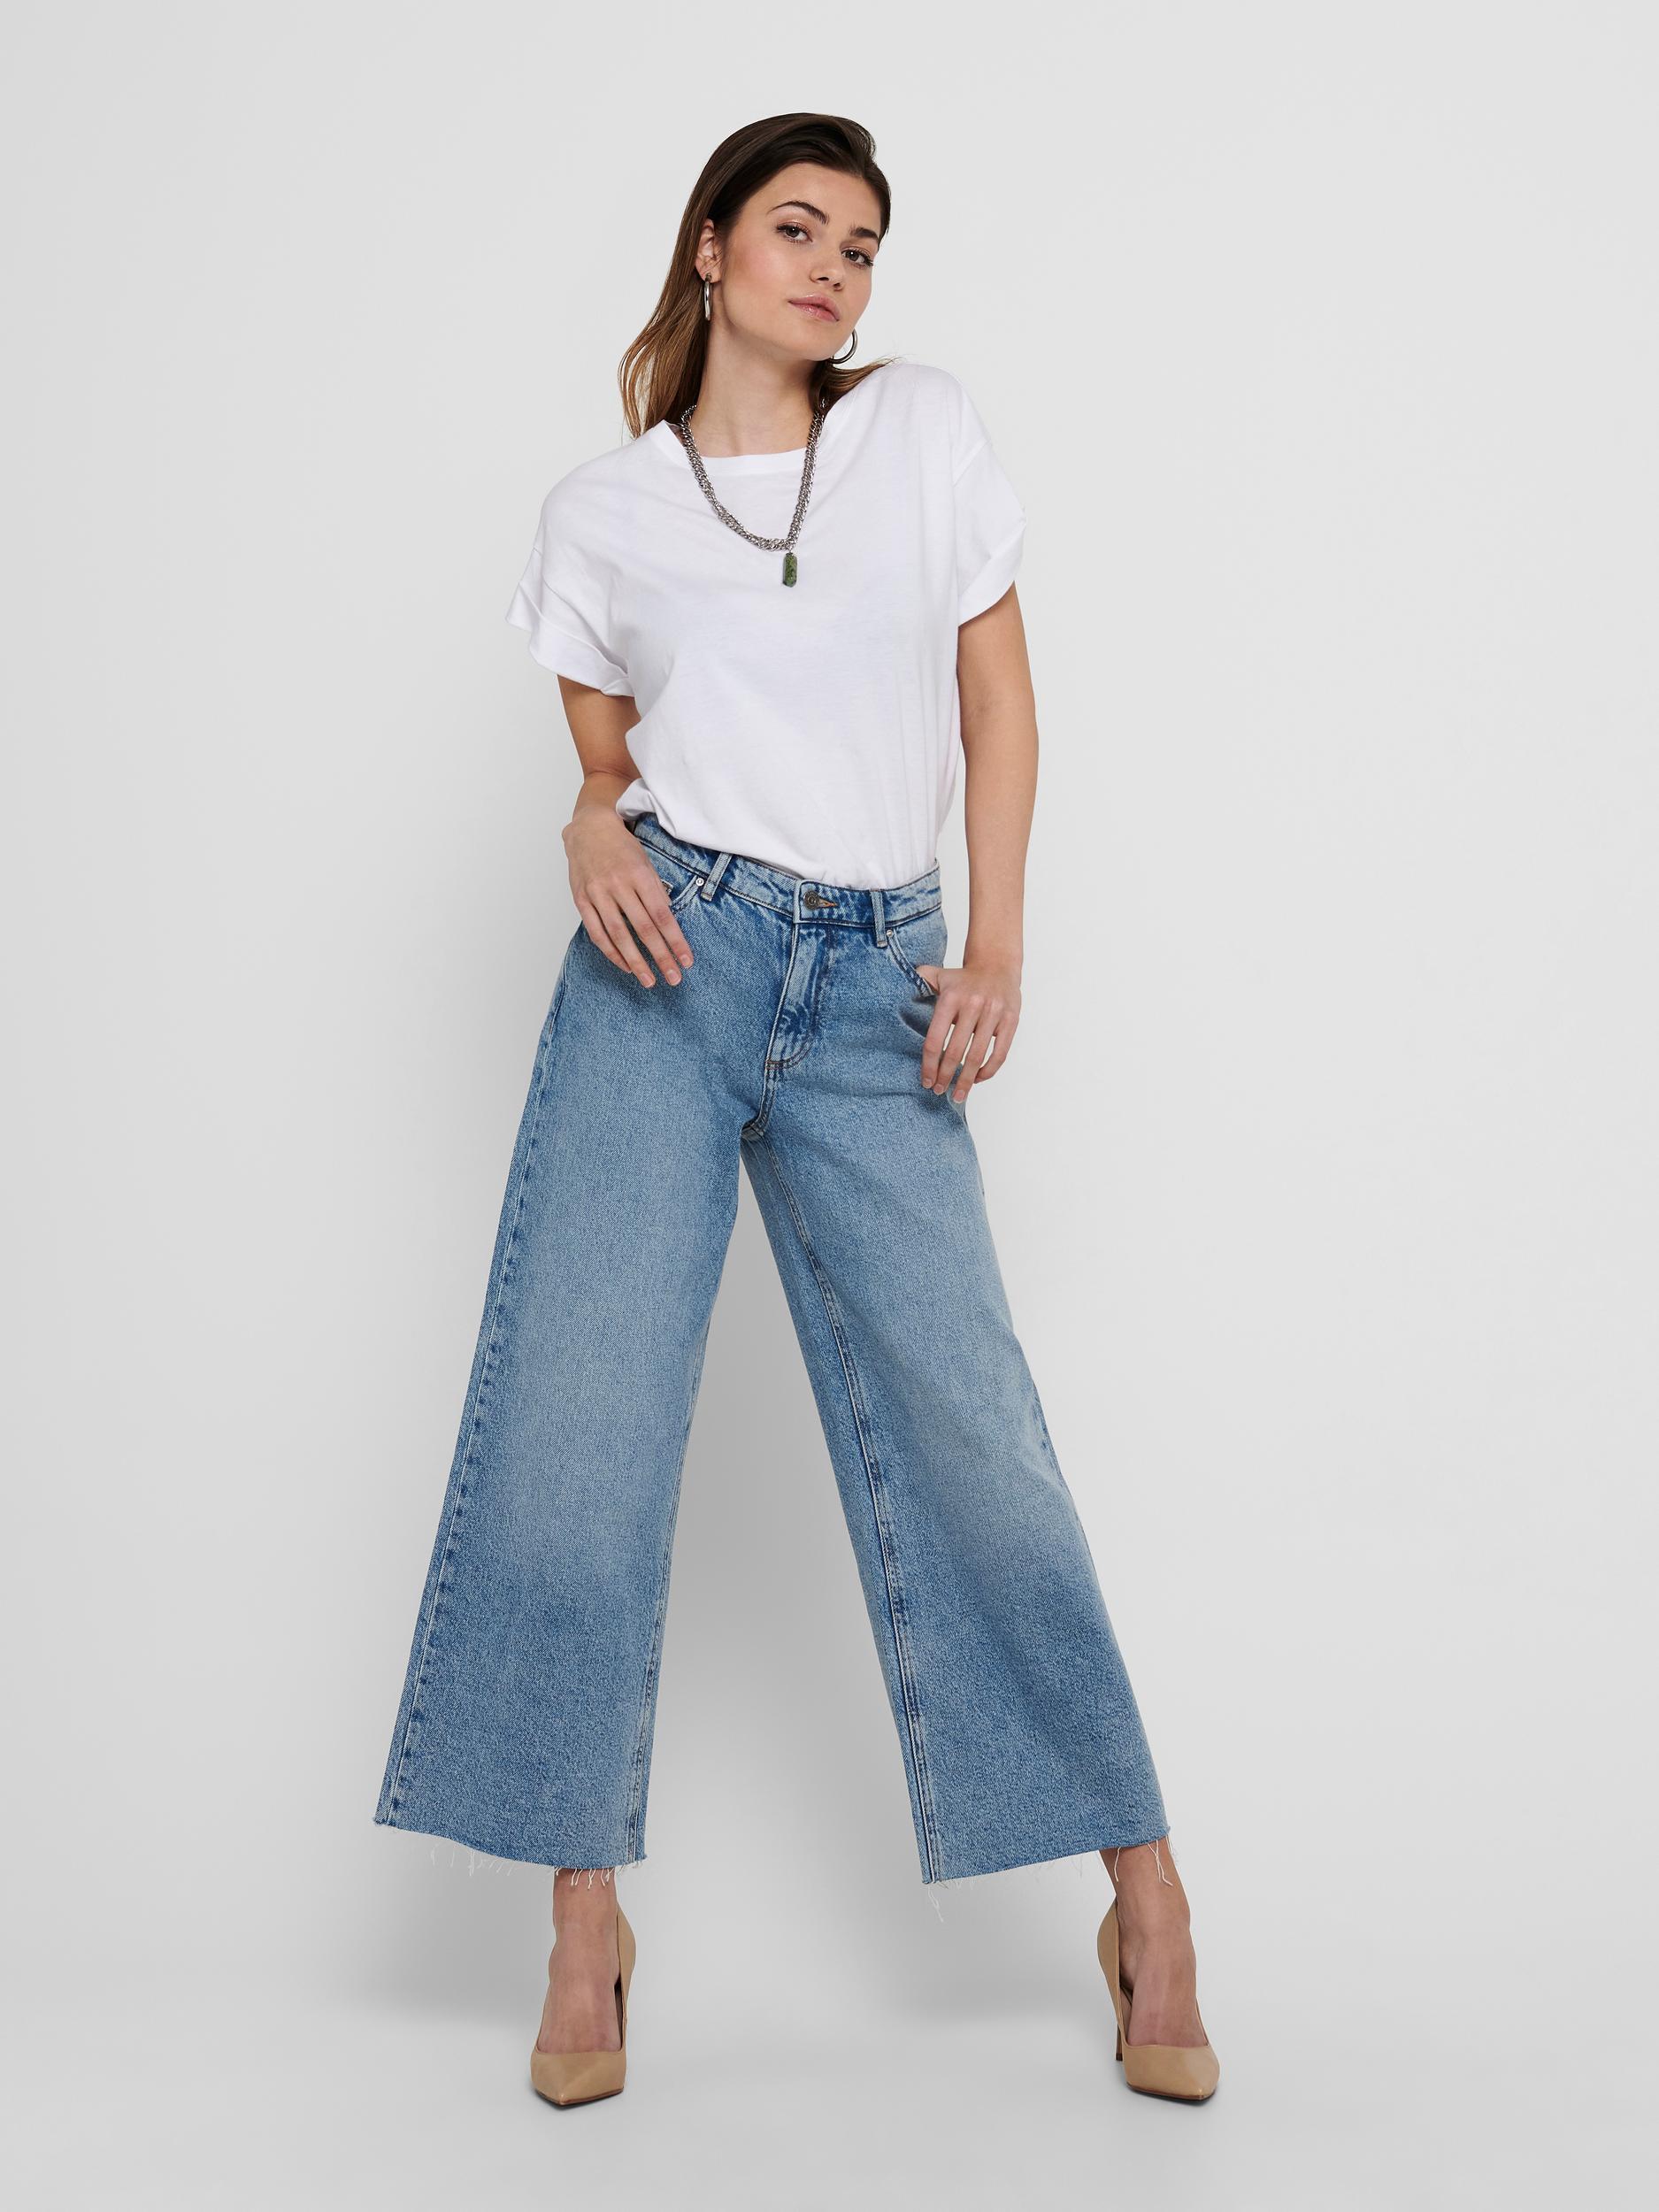 Only Sonny Jeans ONLY | Jeans | 15209459LIGHT BLUE DENIM